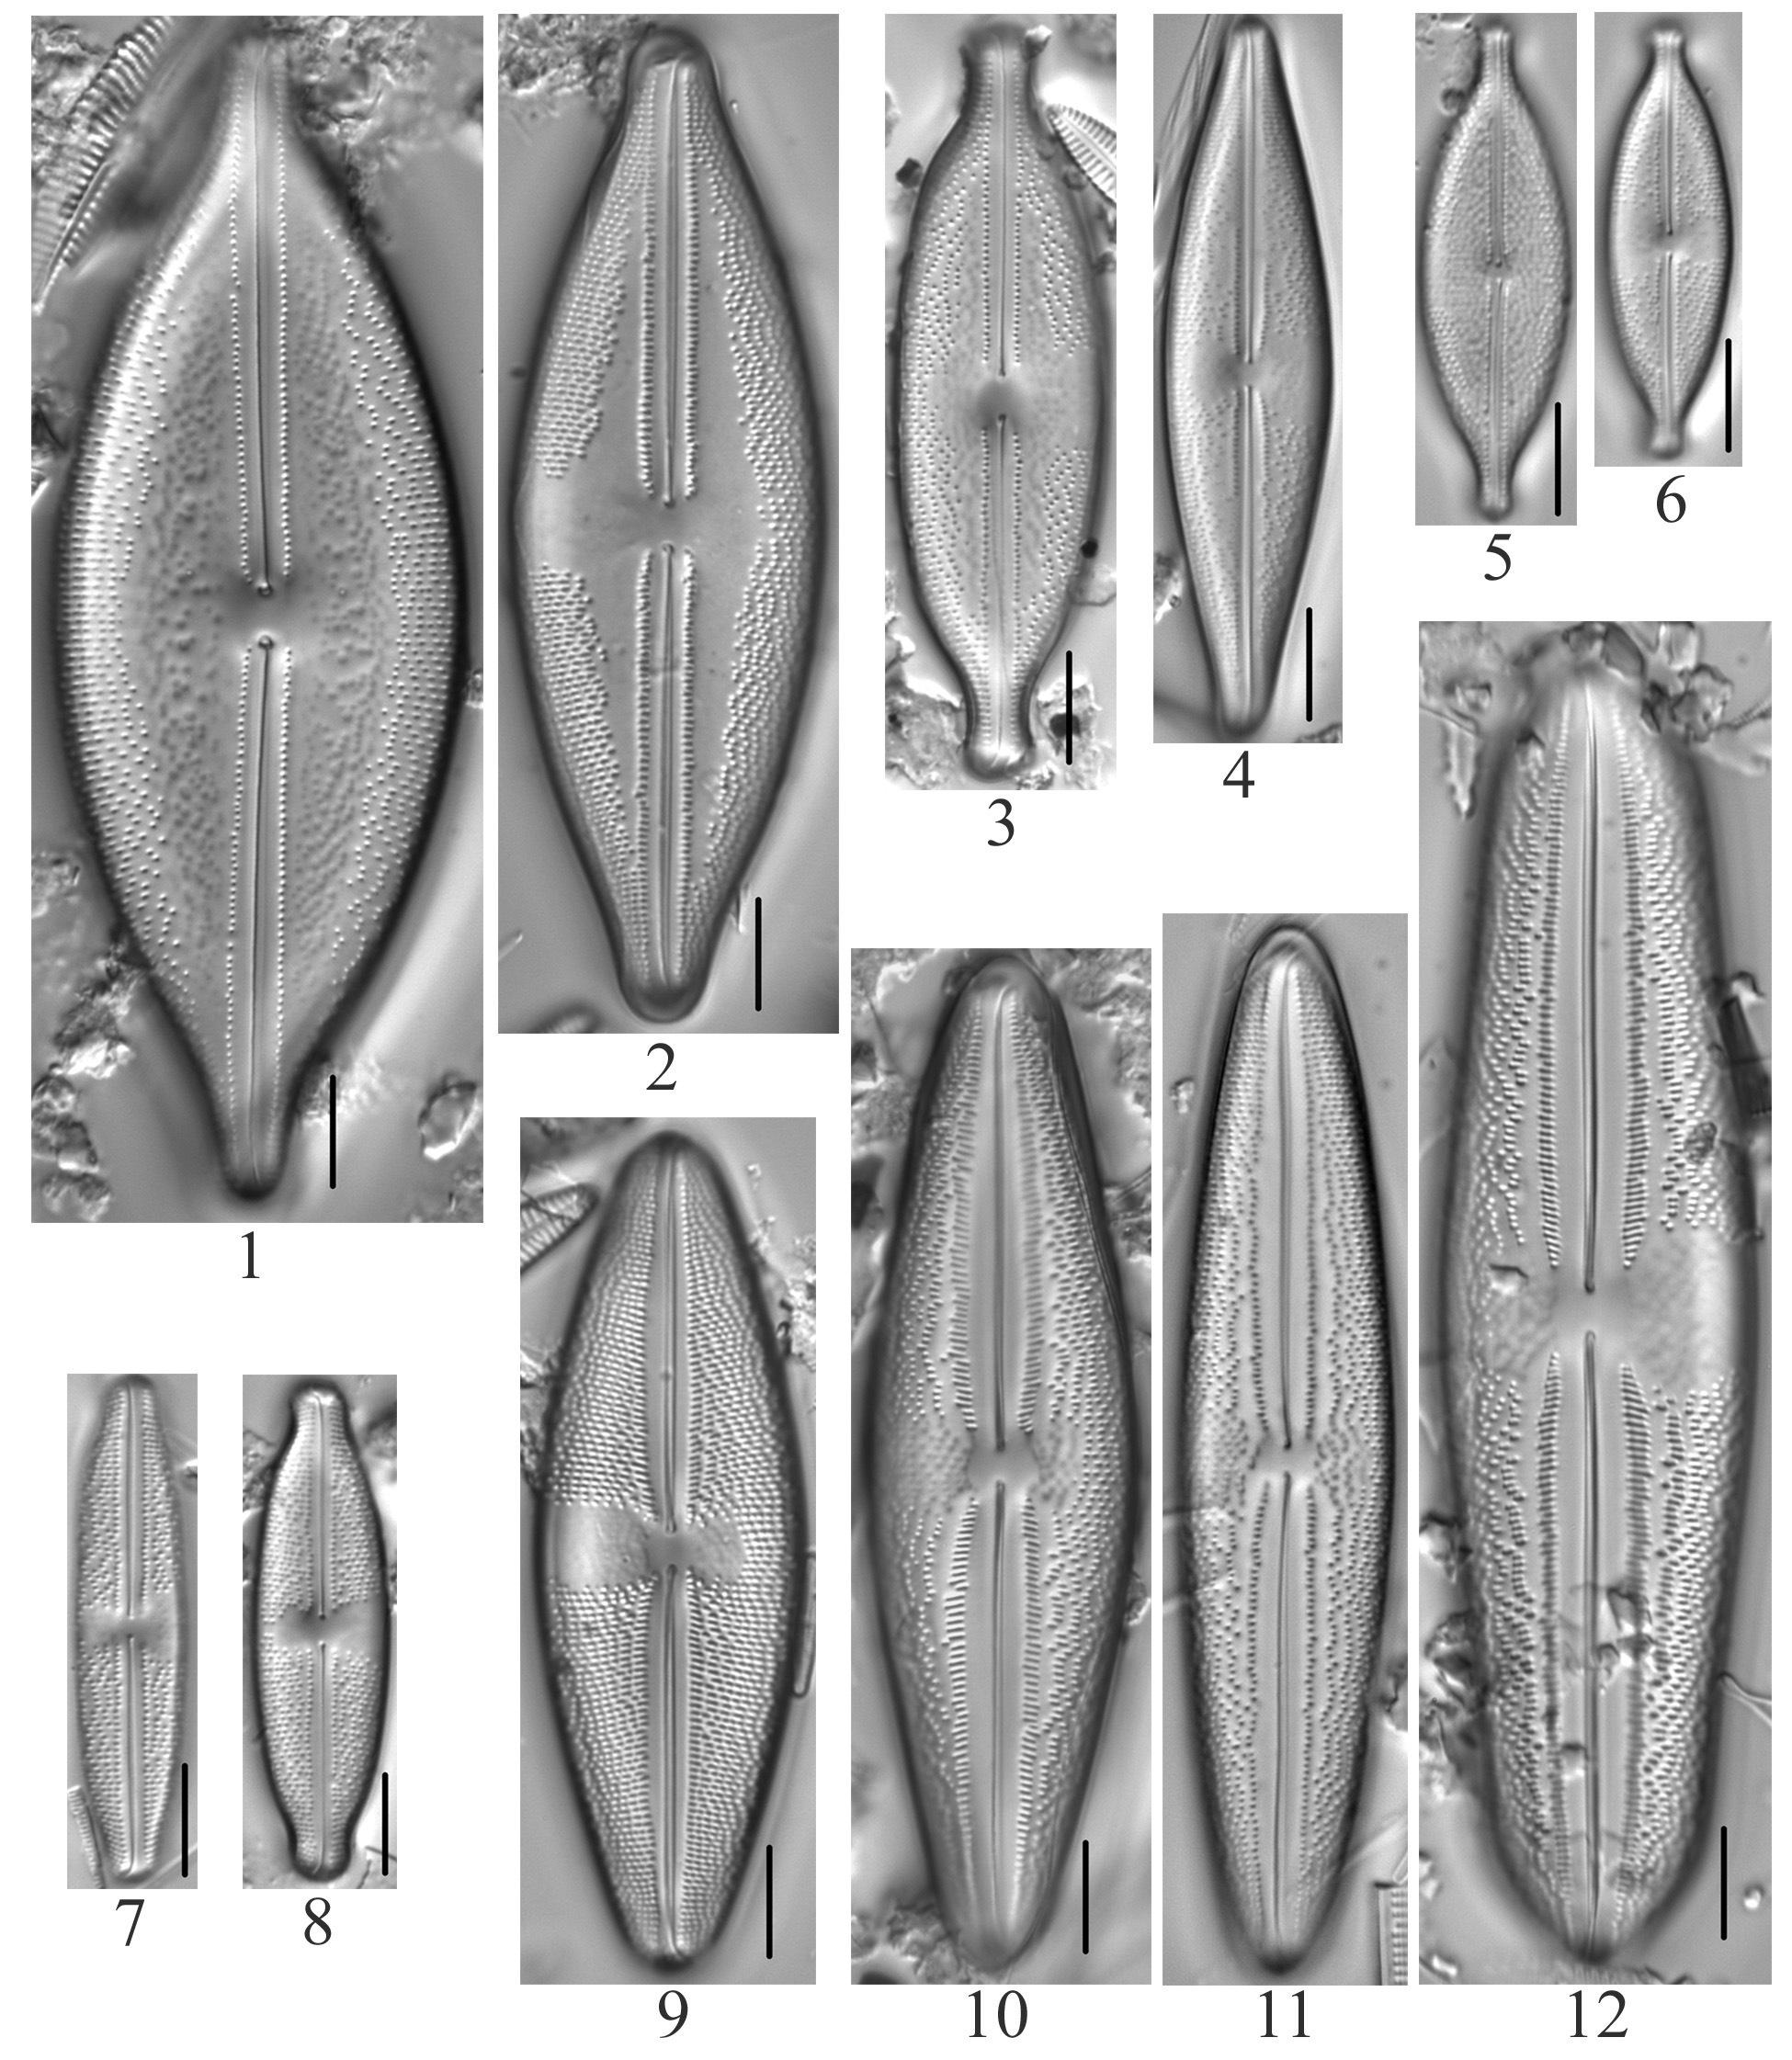 Anomoeoneis Plate 1 Costata